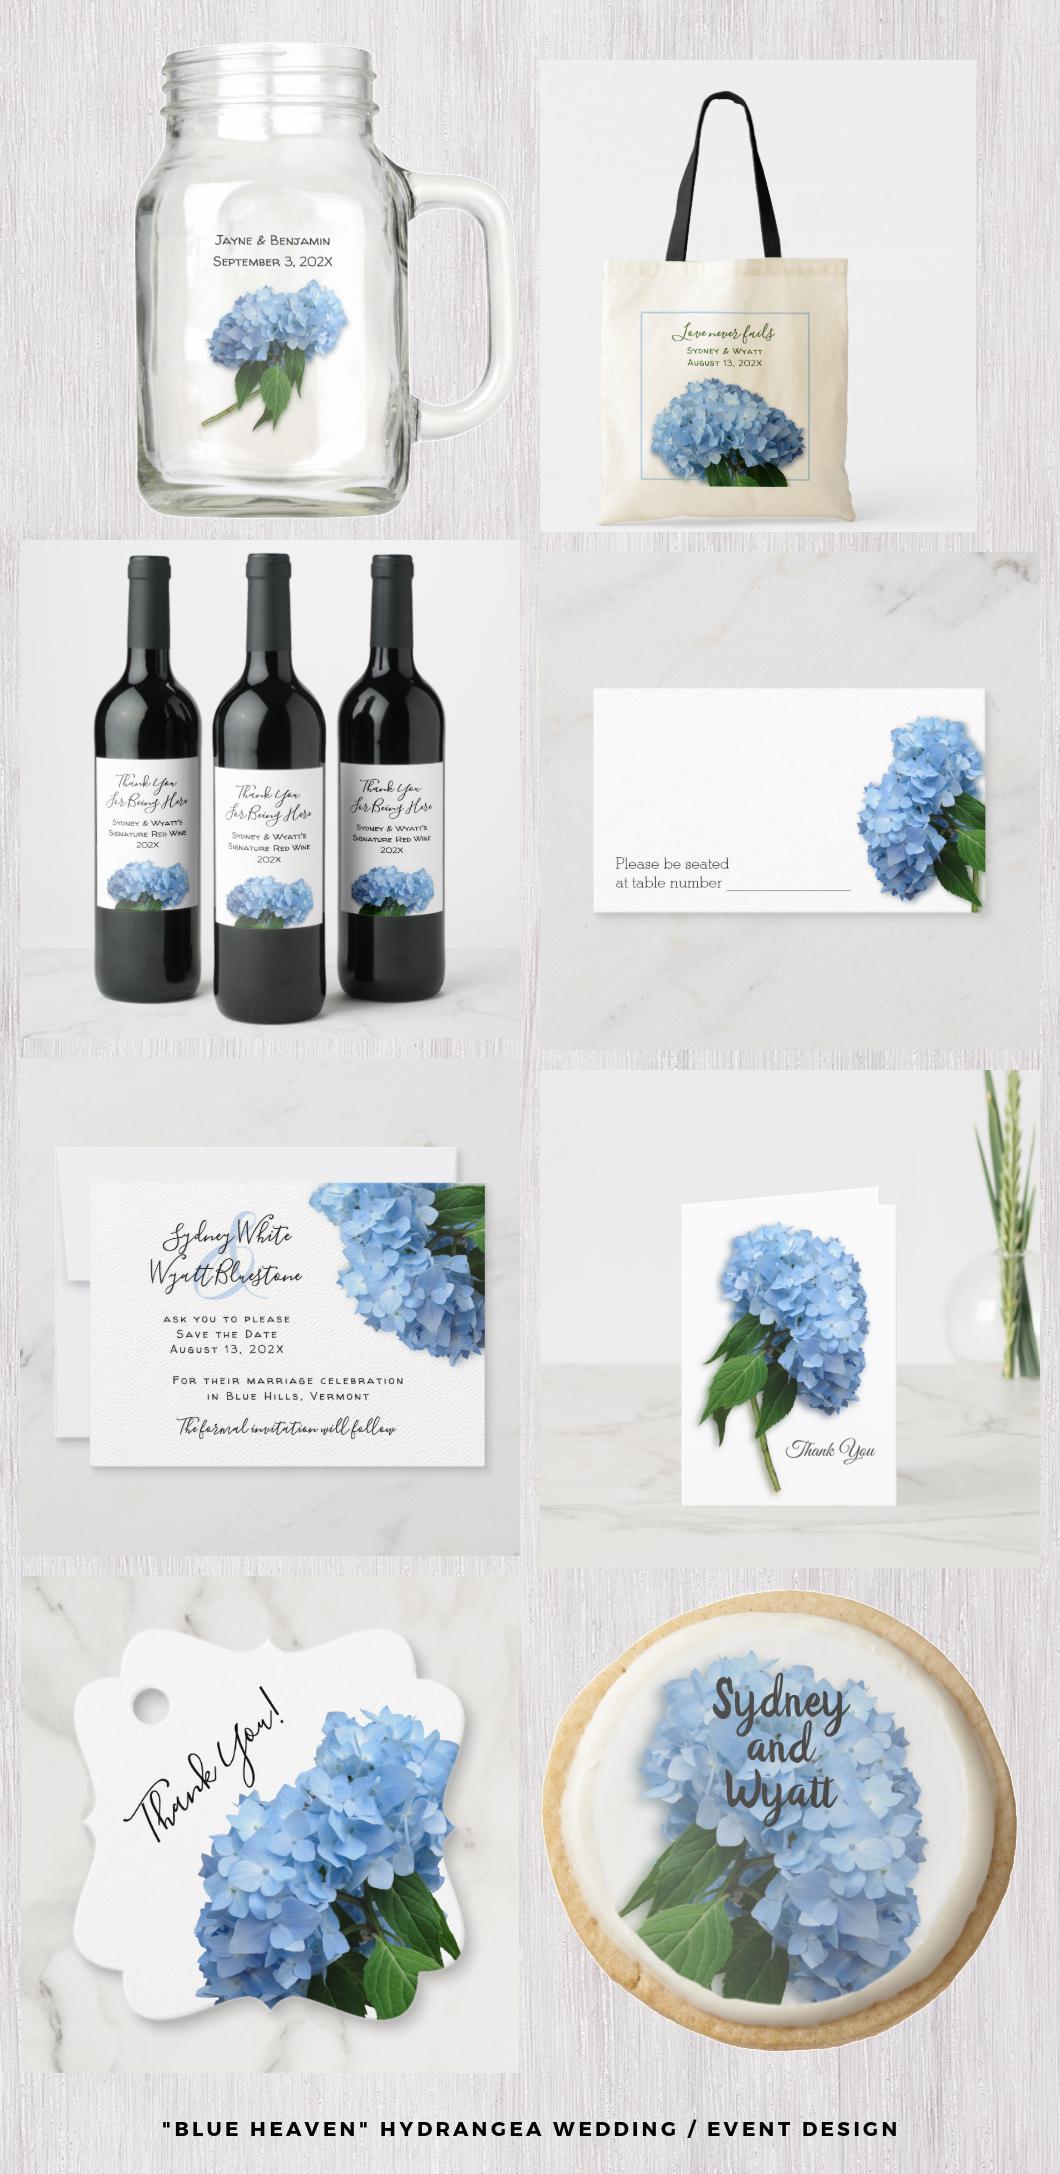 Light blue hydrangea wedding stationery set Blue Heaven